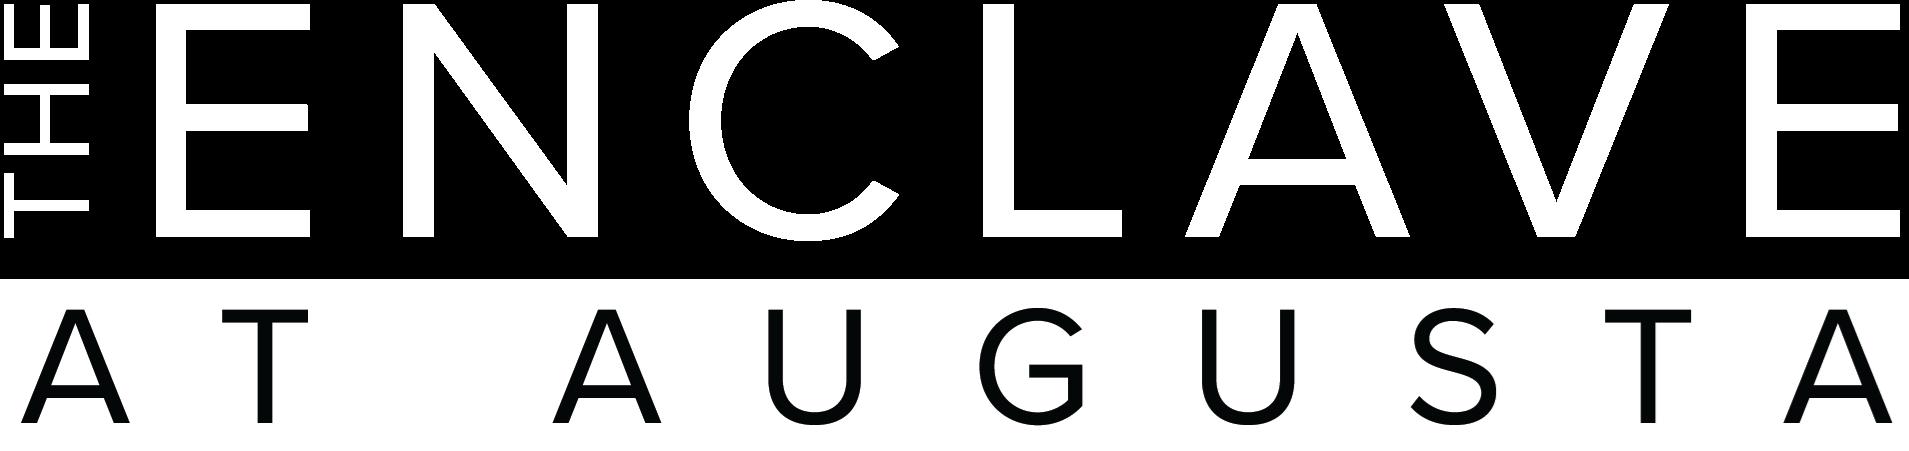 Augusta Property Logo 1